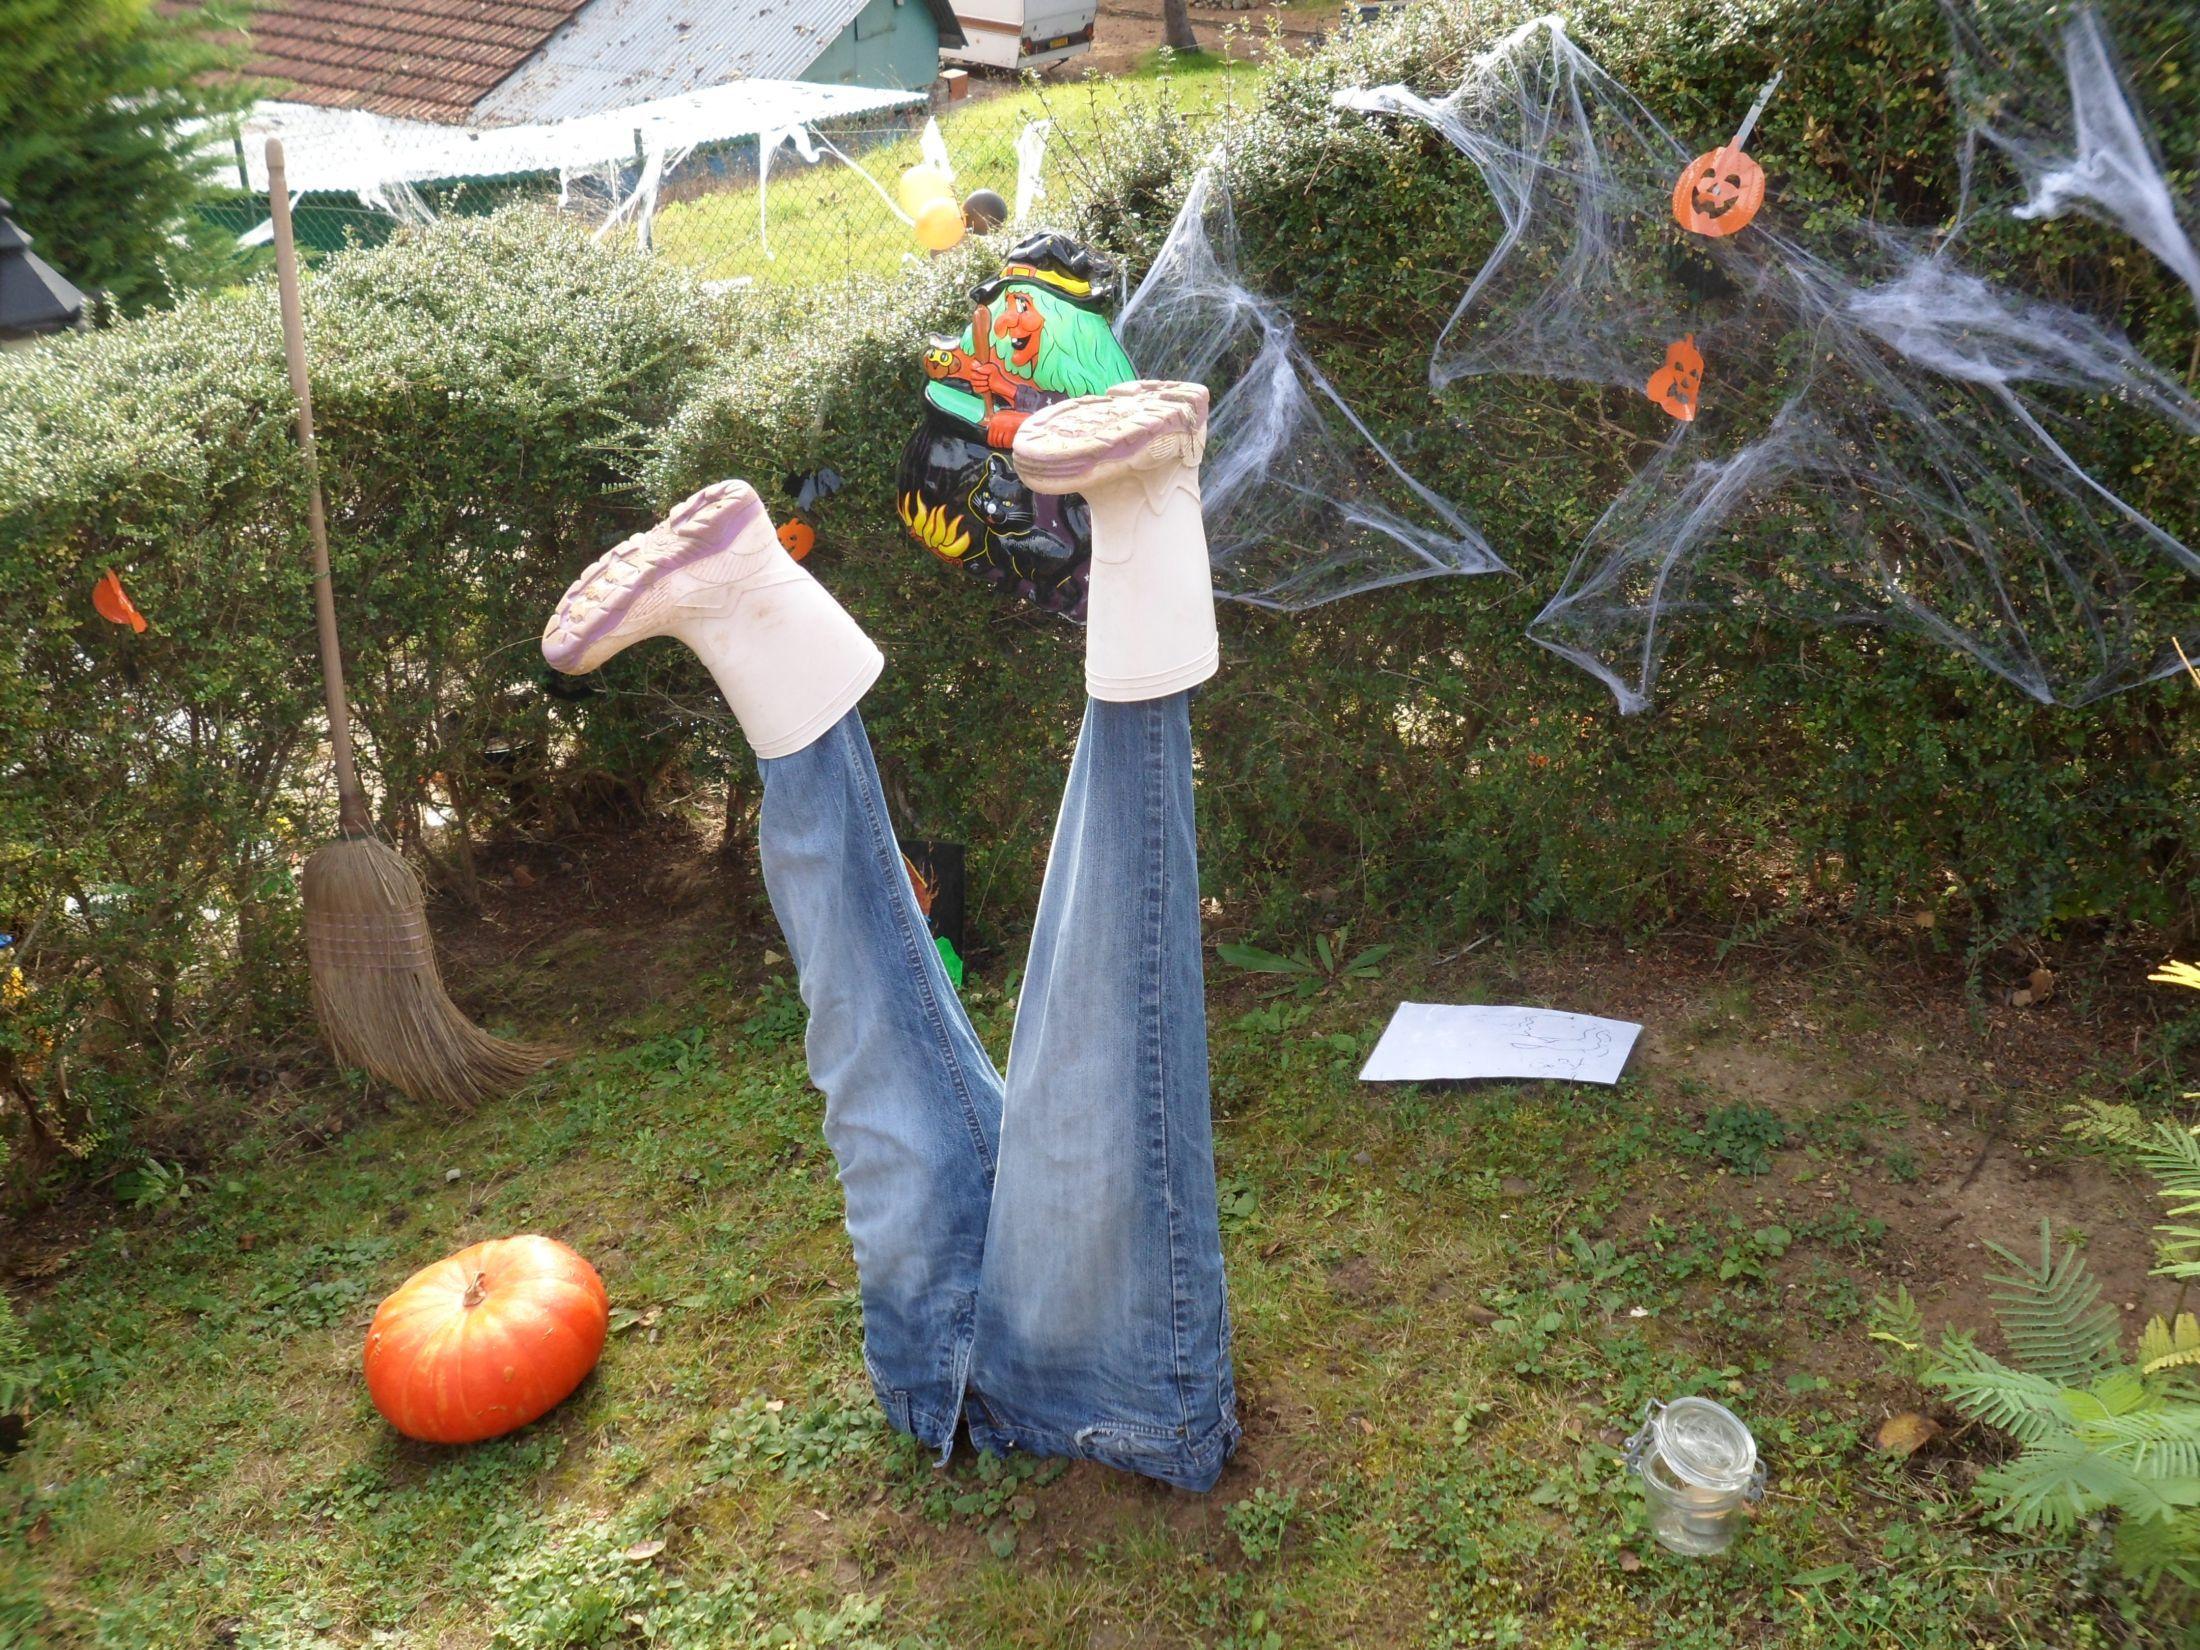 comment decorer son jardin pour halloween | halloween | Pinterest ...